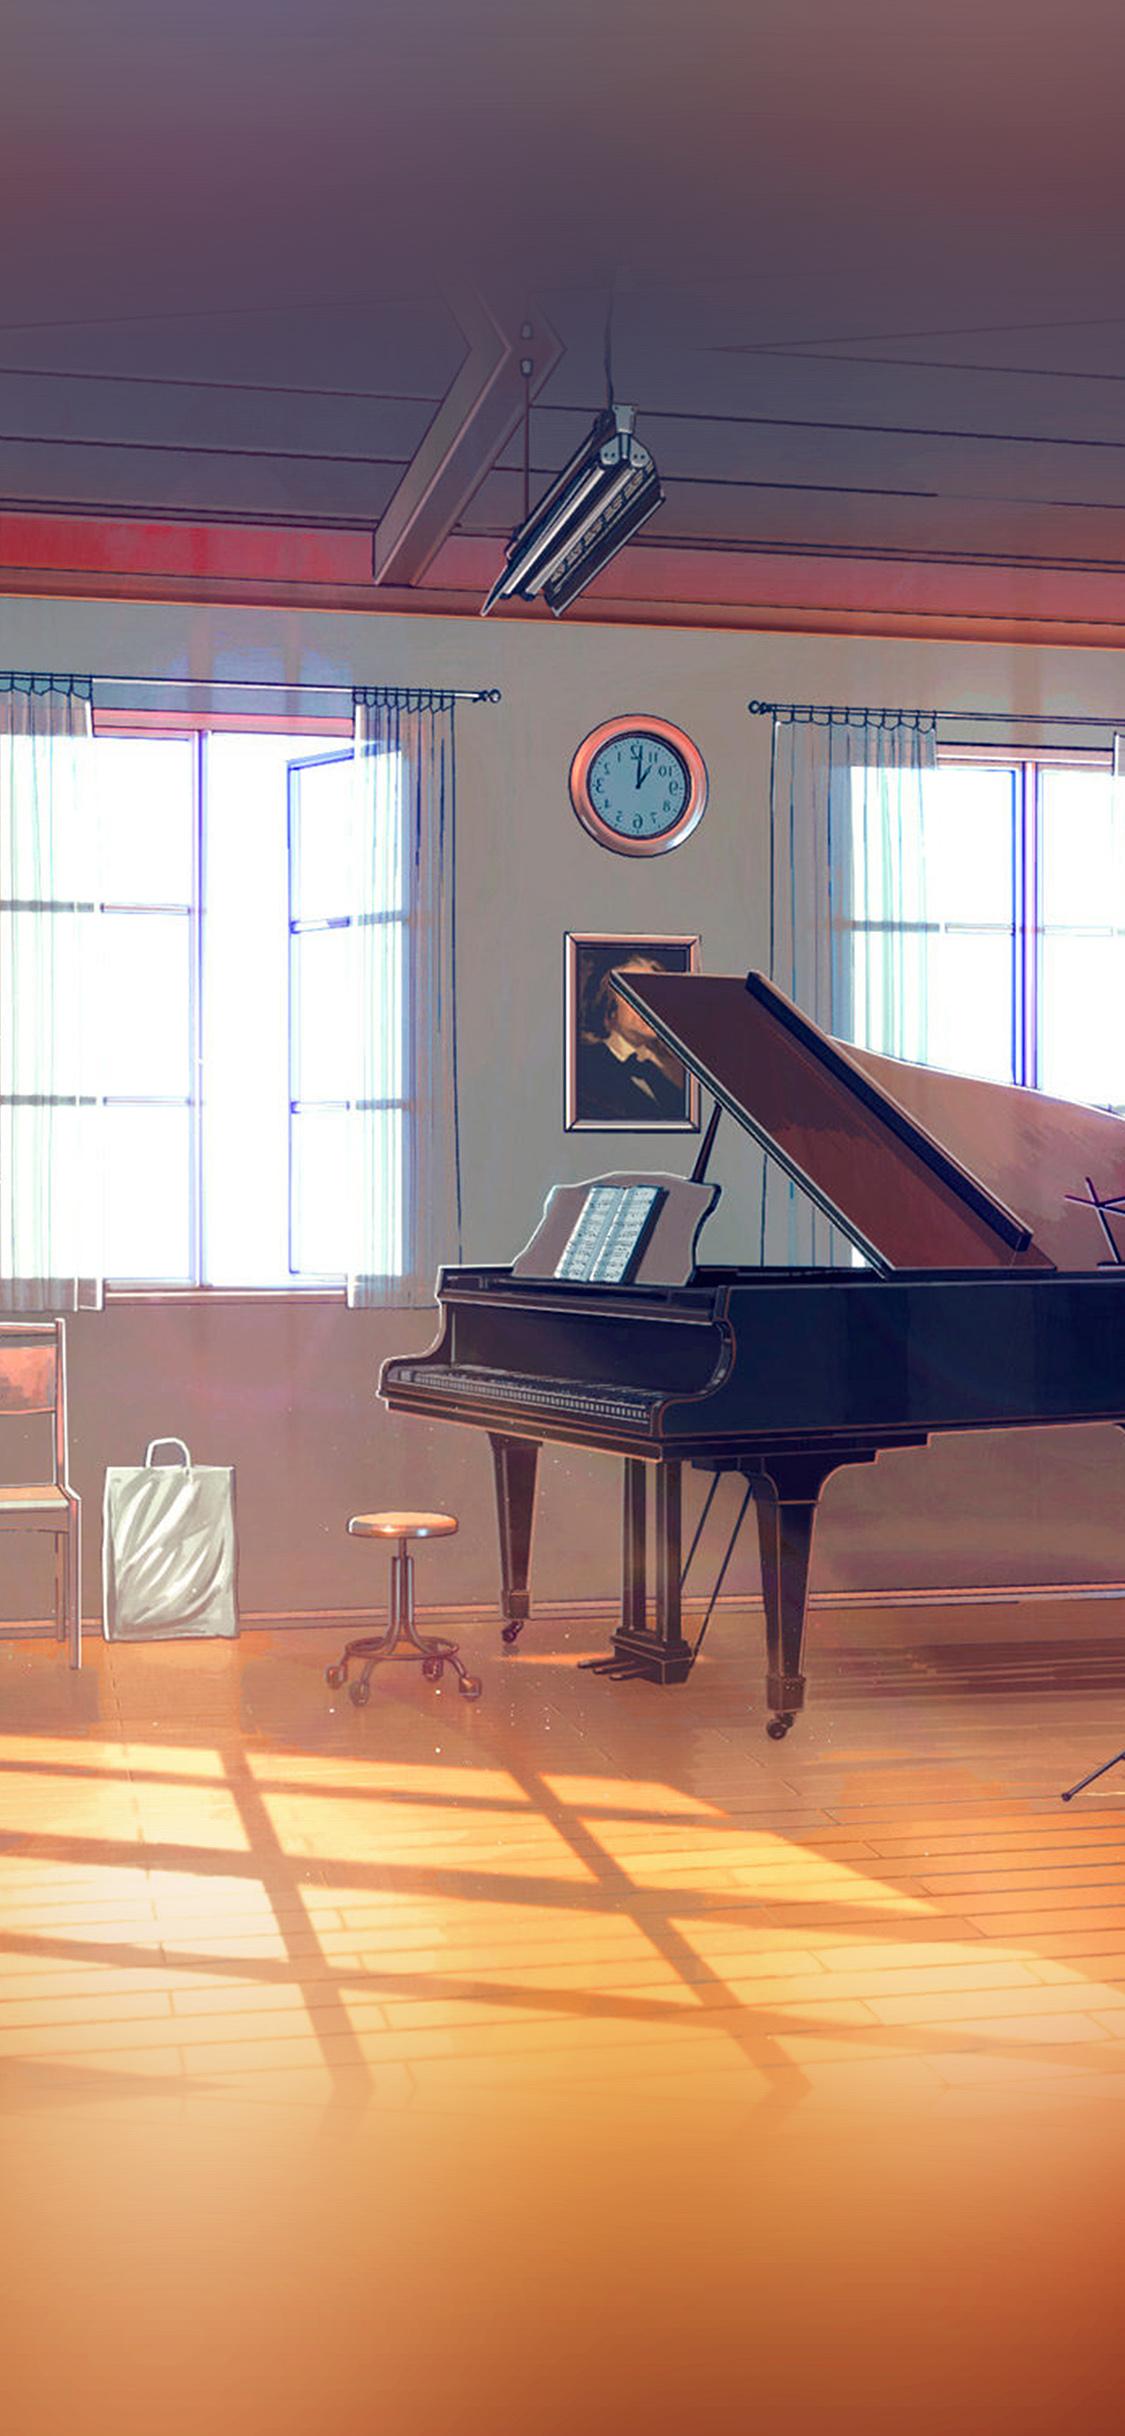 Video Game Iphone X Wallpaper Aw49 Arseniy Chebynkin Music Room Piano Illustration Art